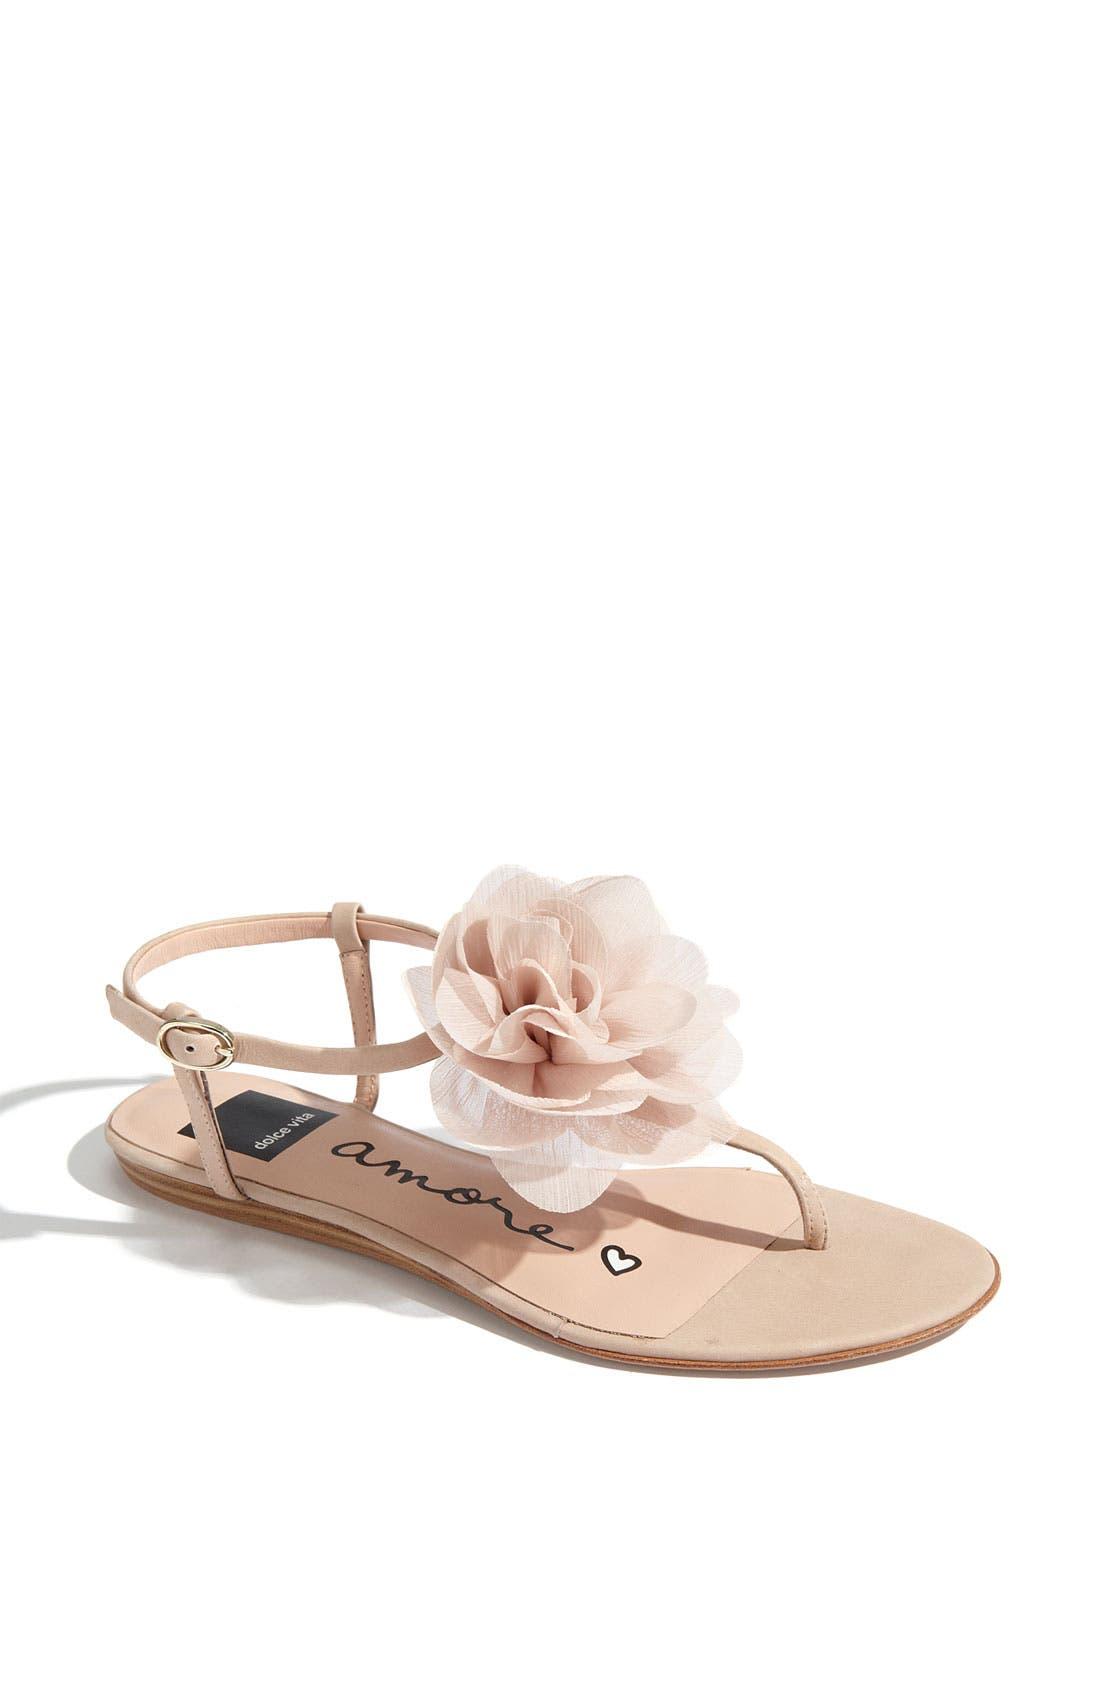 Alternate Image 1 Selected - Dolce Vita 'Felice' Sandal